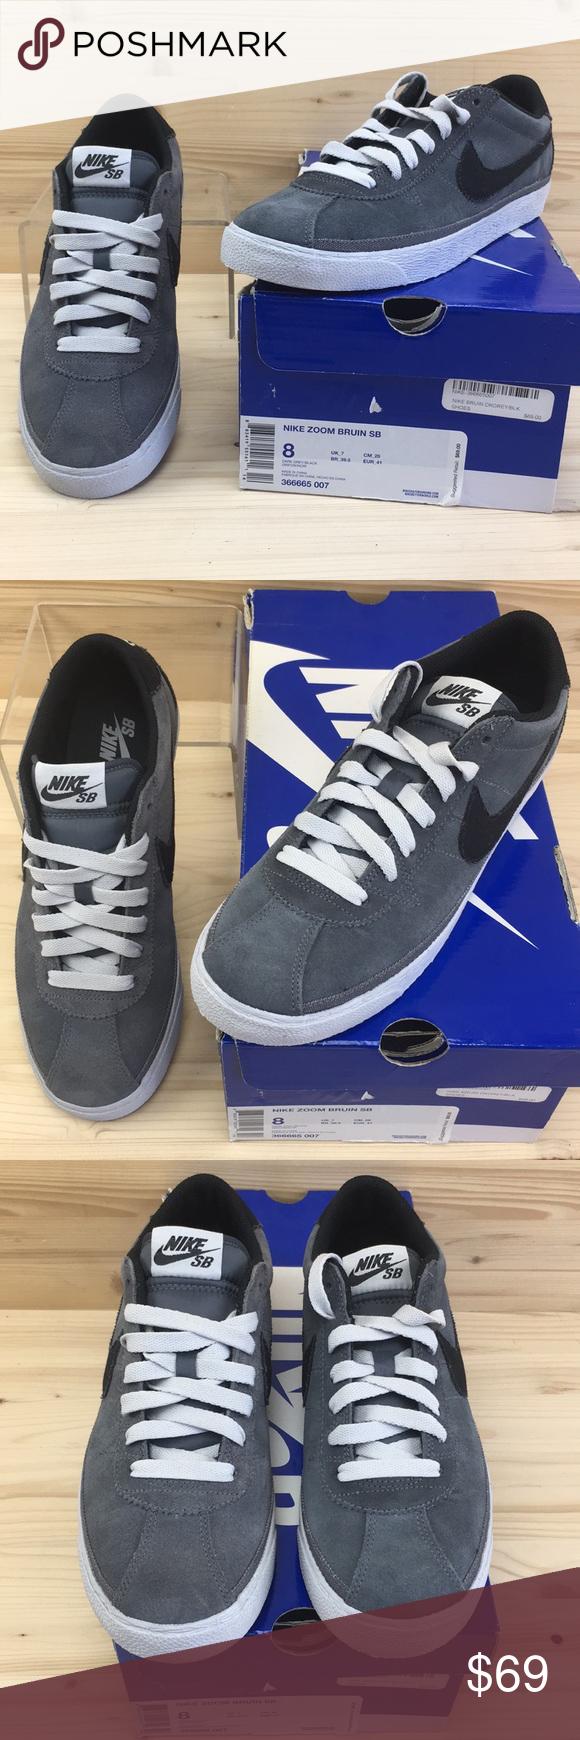 best loved e4fe4 811d9 Nike SB Zoom Bruin Drk Grey Black Mens Size 8 NIB Nike SB Zoom Bruin